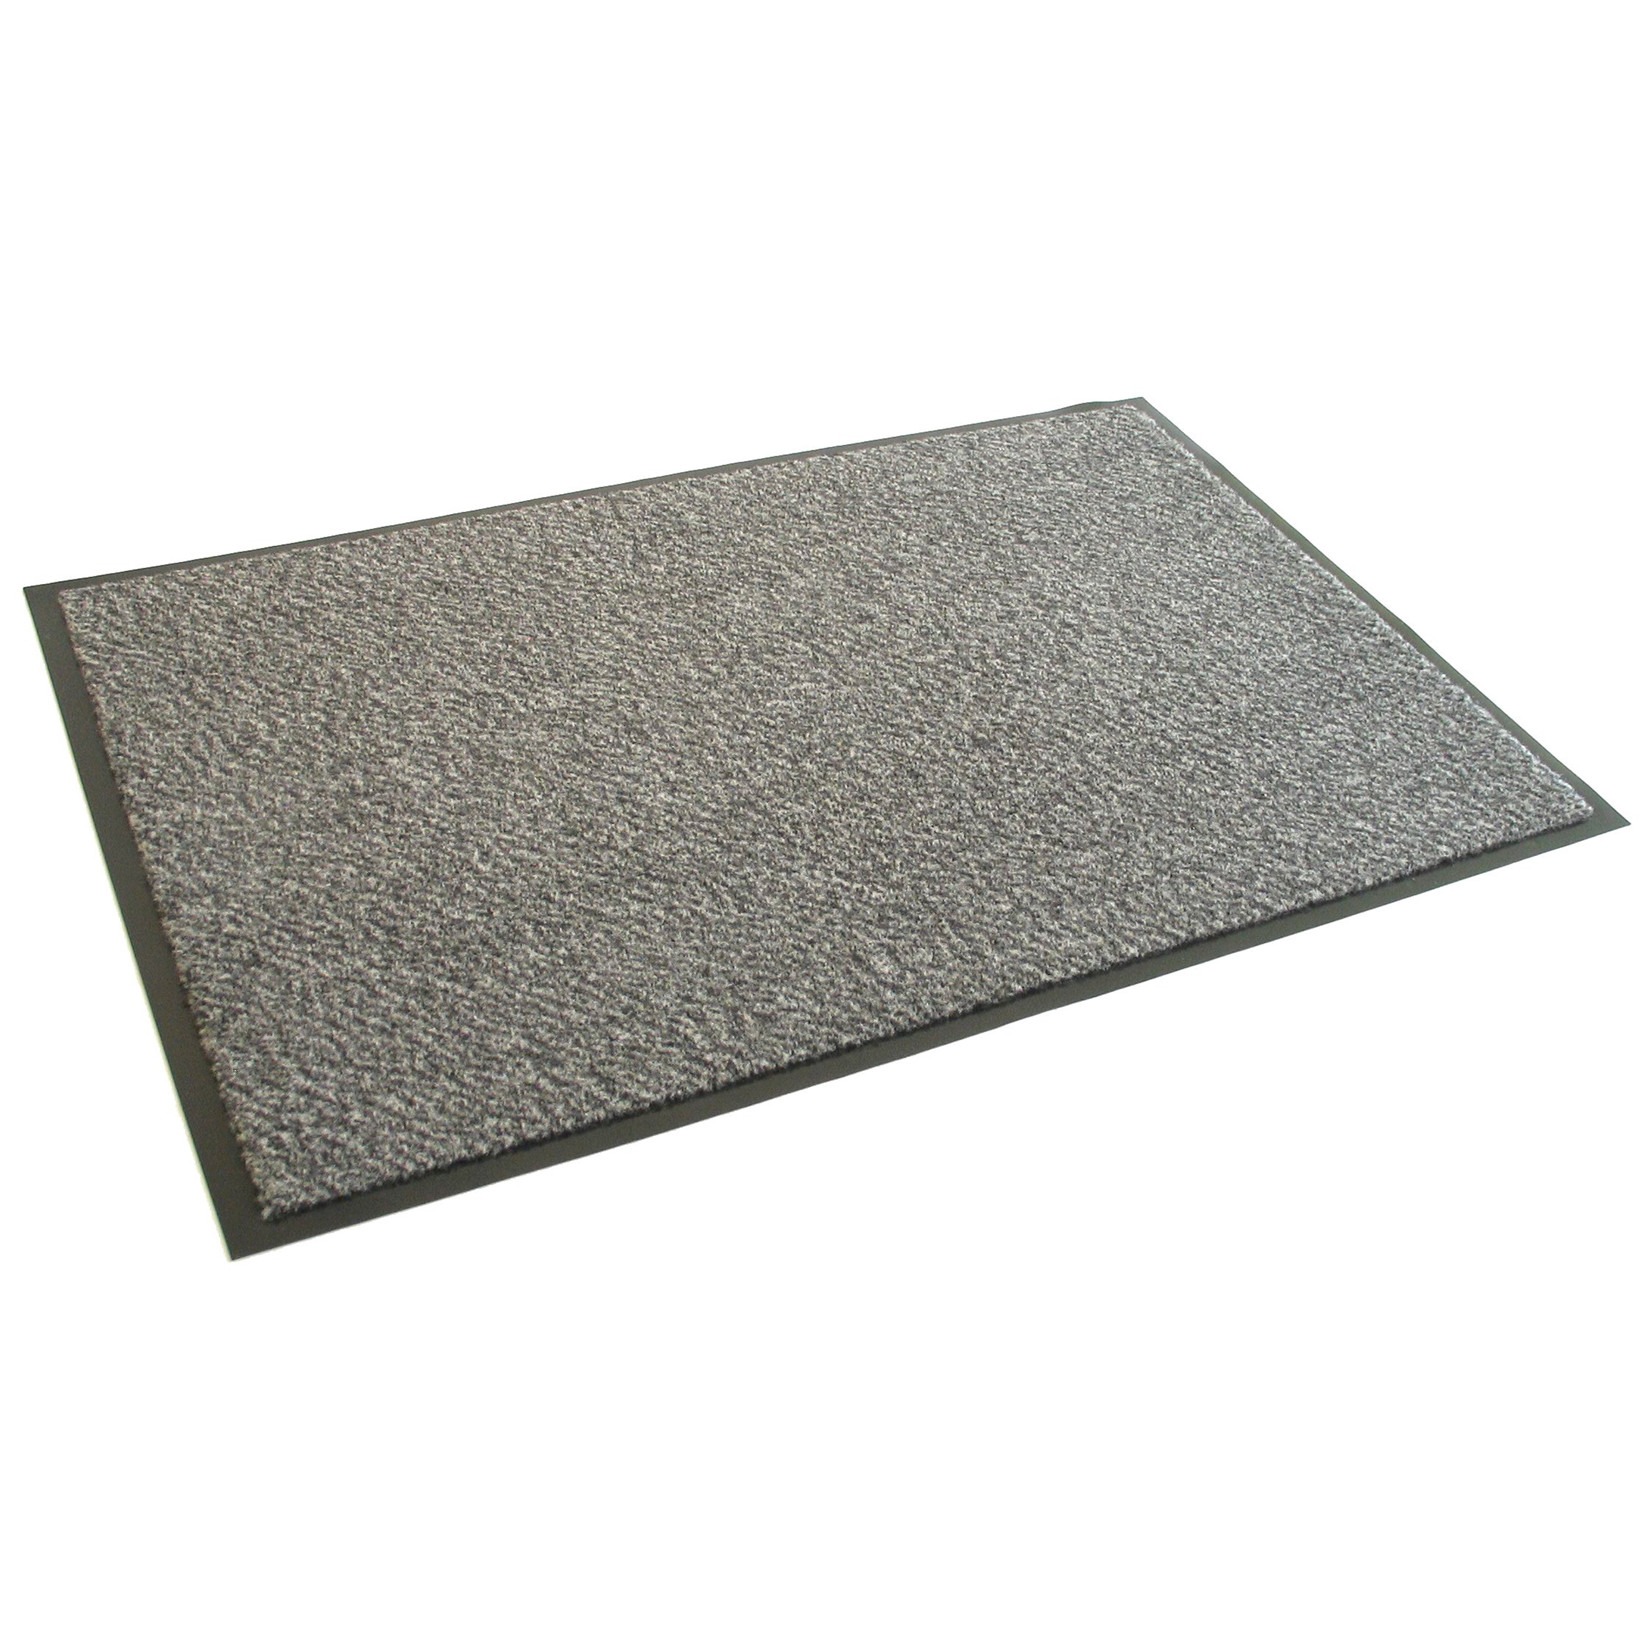 Dørmåtte 1000 Clean Carpet Classic - Lysgrå 90 x 130 cm